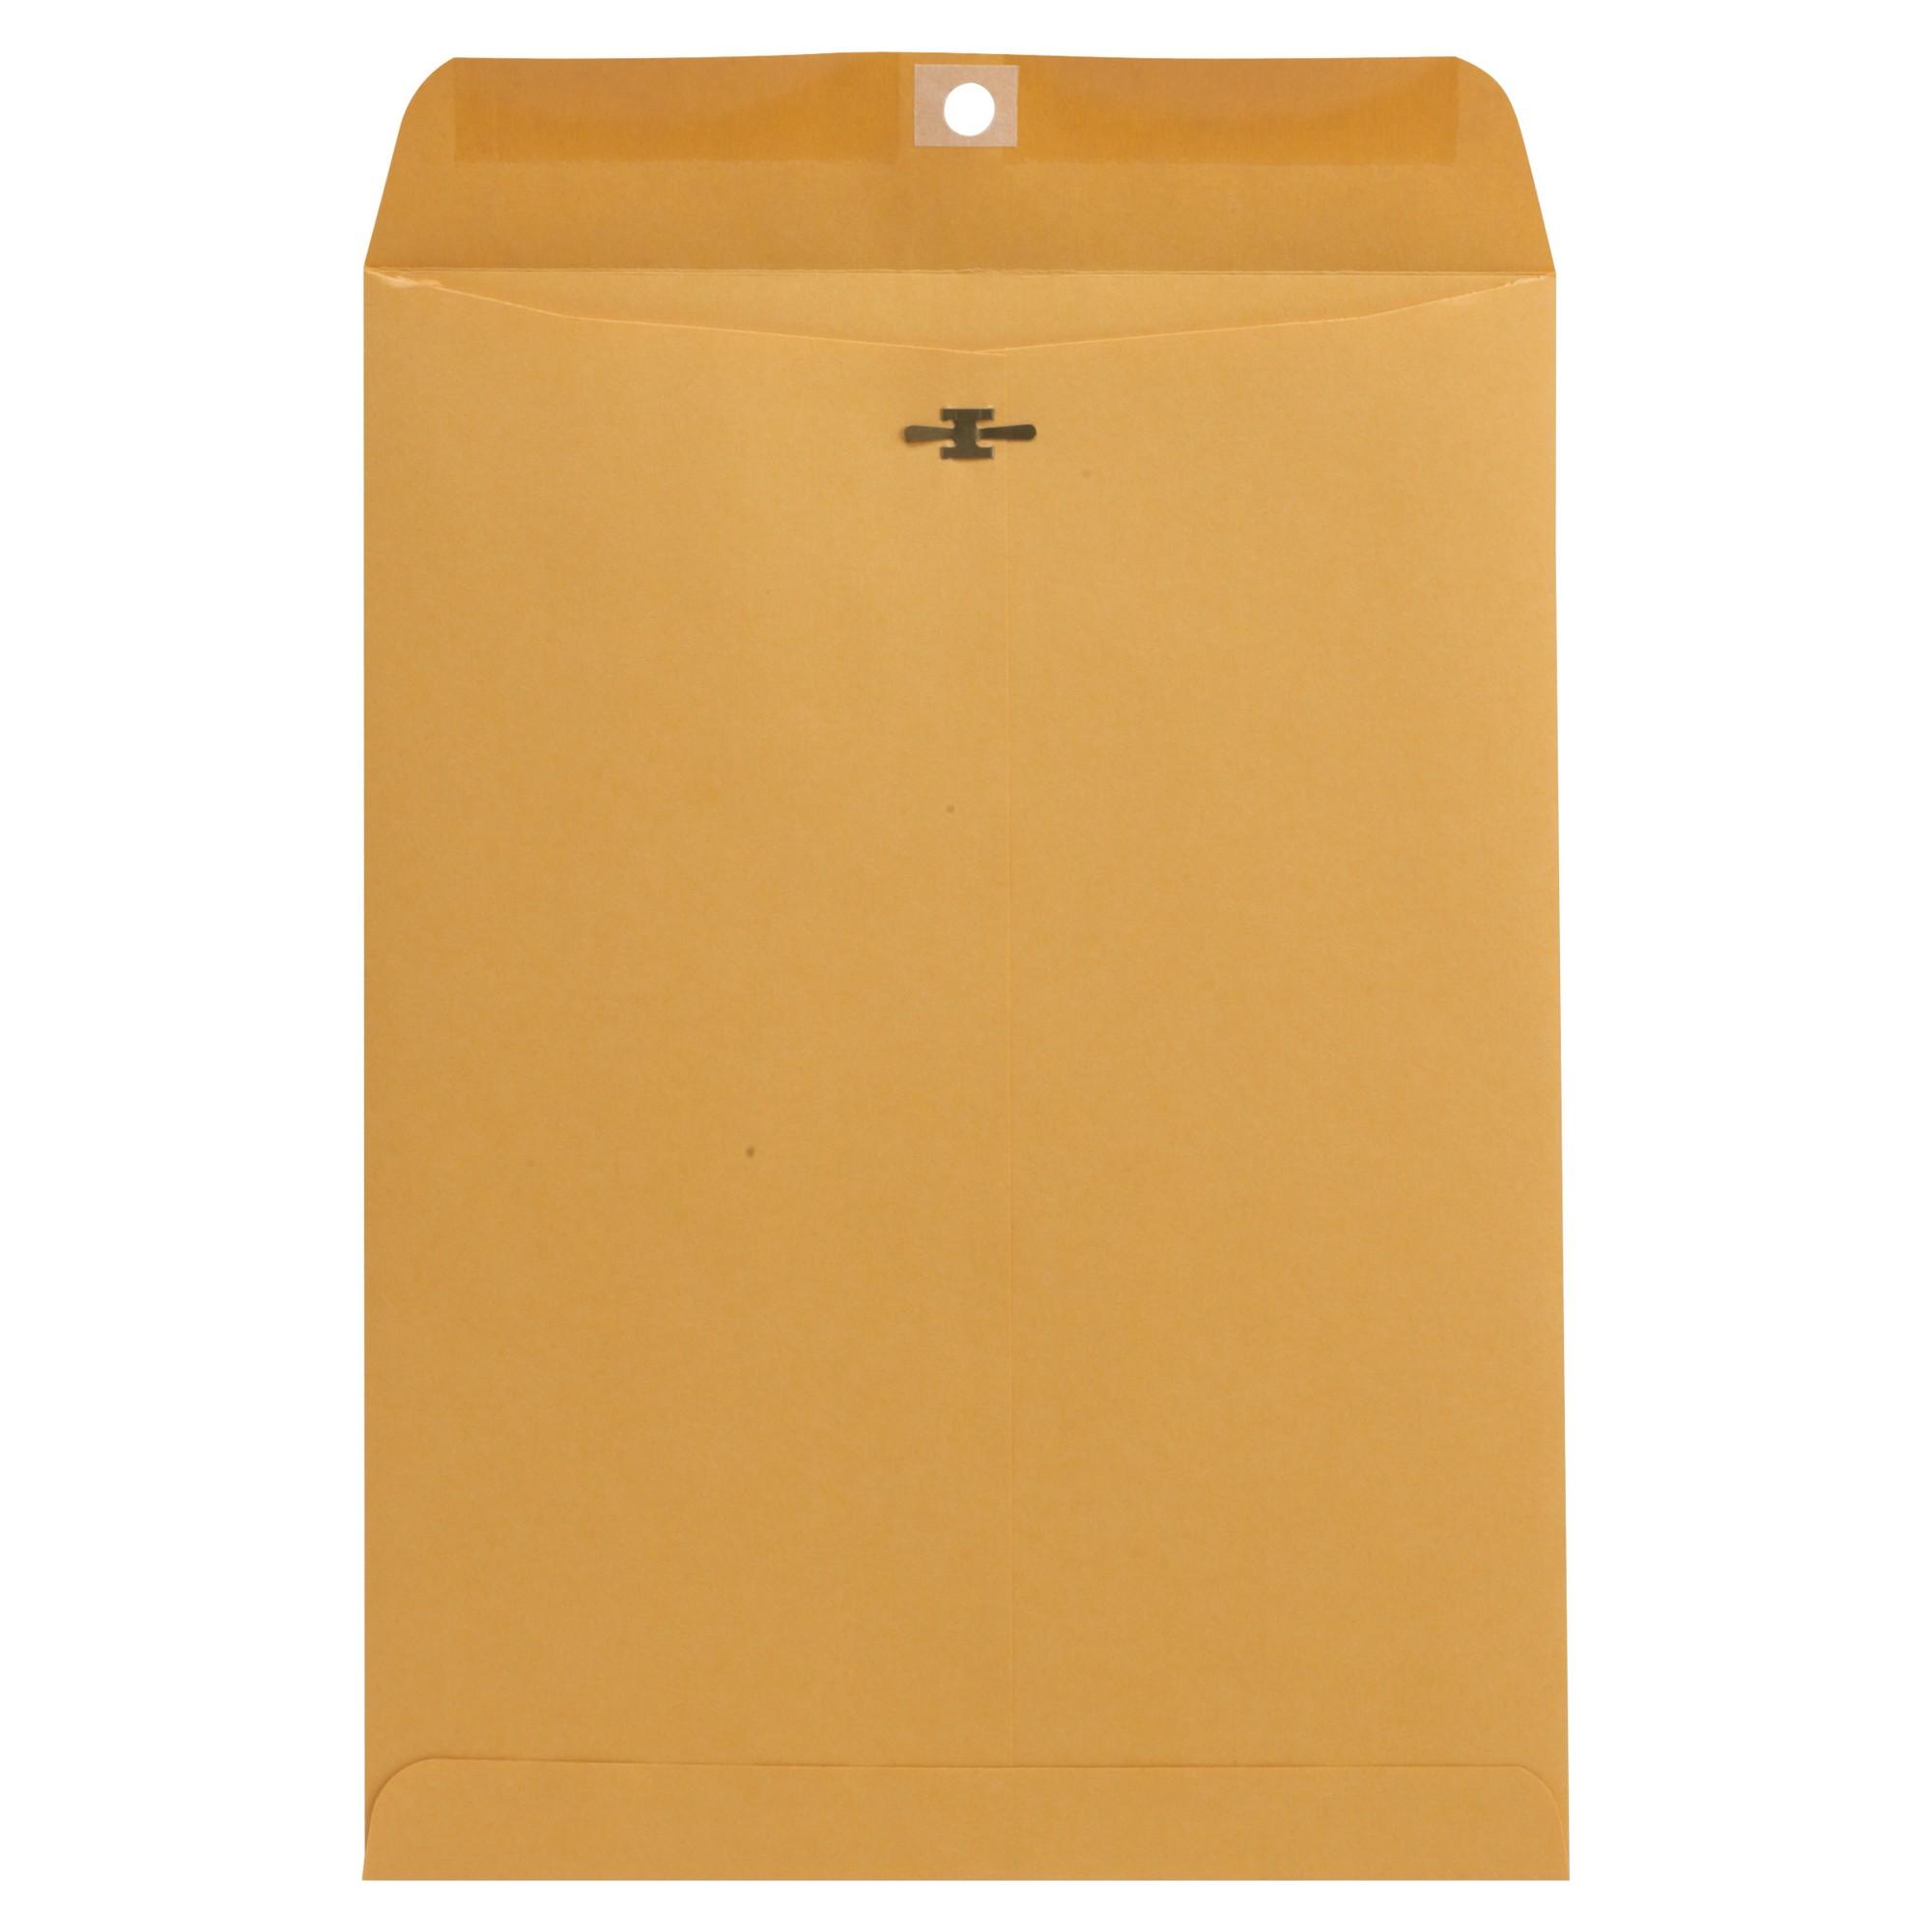 Kraft Clasp Envelope, Center Seam, 32lb, 9 x 12, Brown Kraft, 100/Box